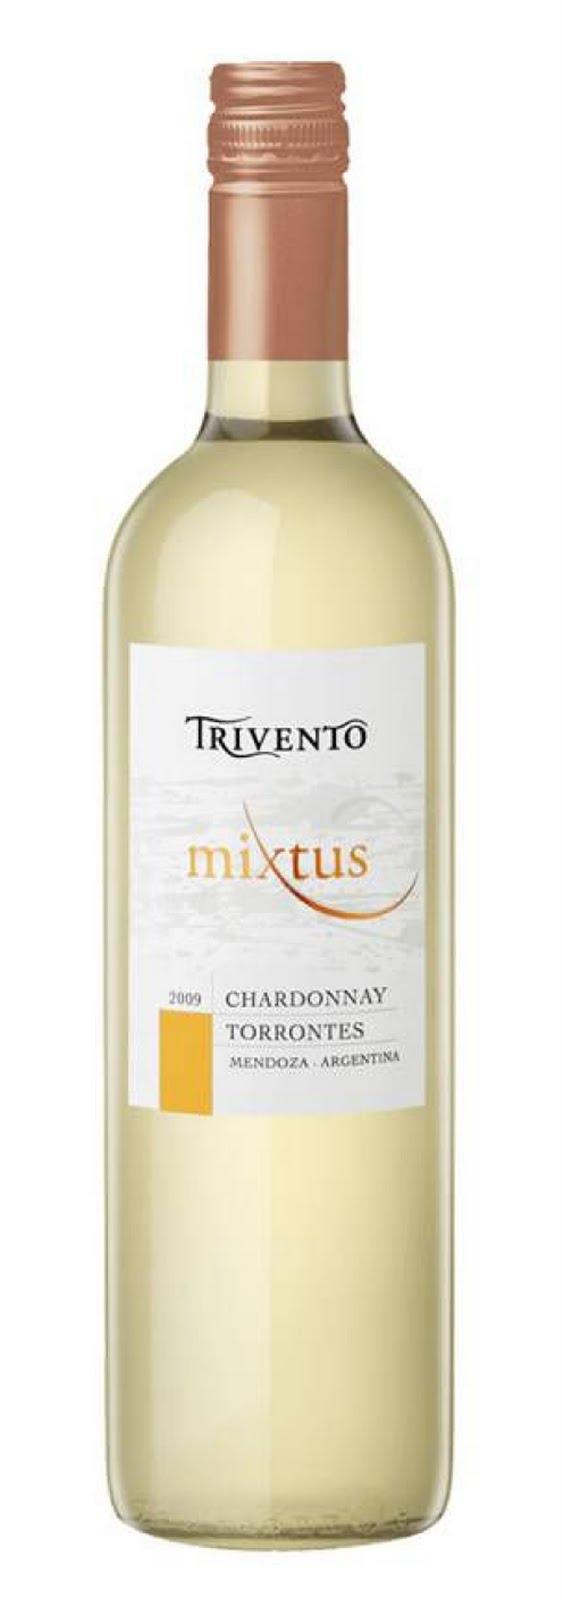 Trivento Mixtus Chardonnay Torrontes